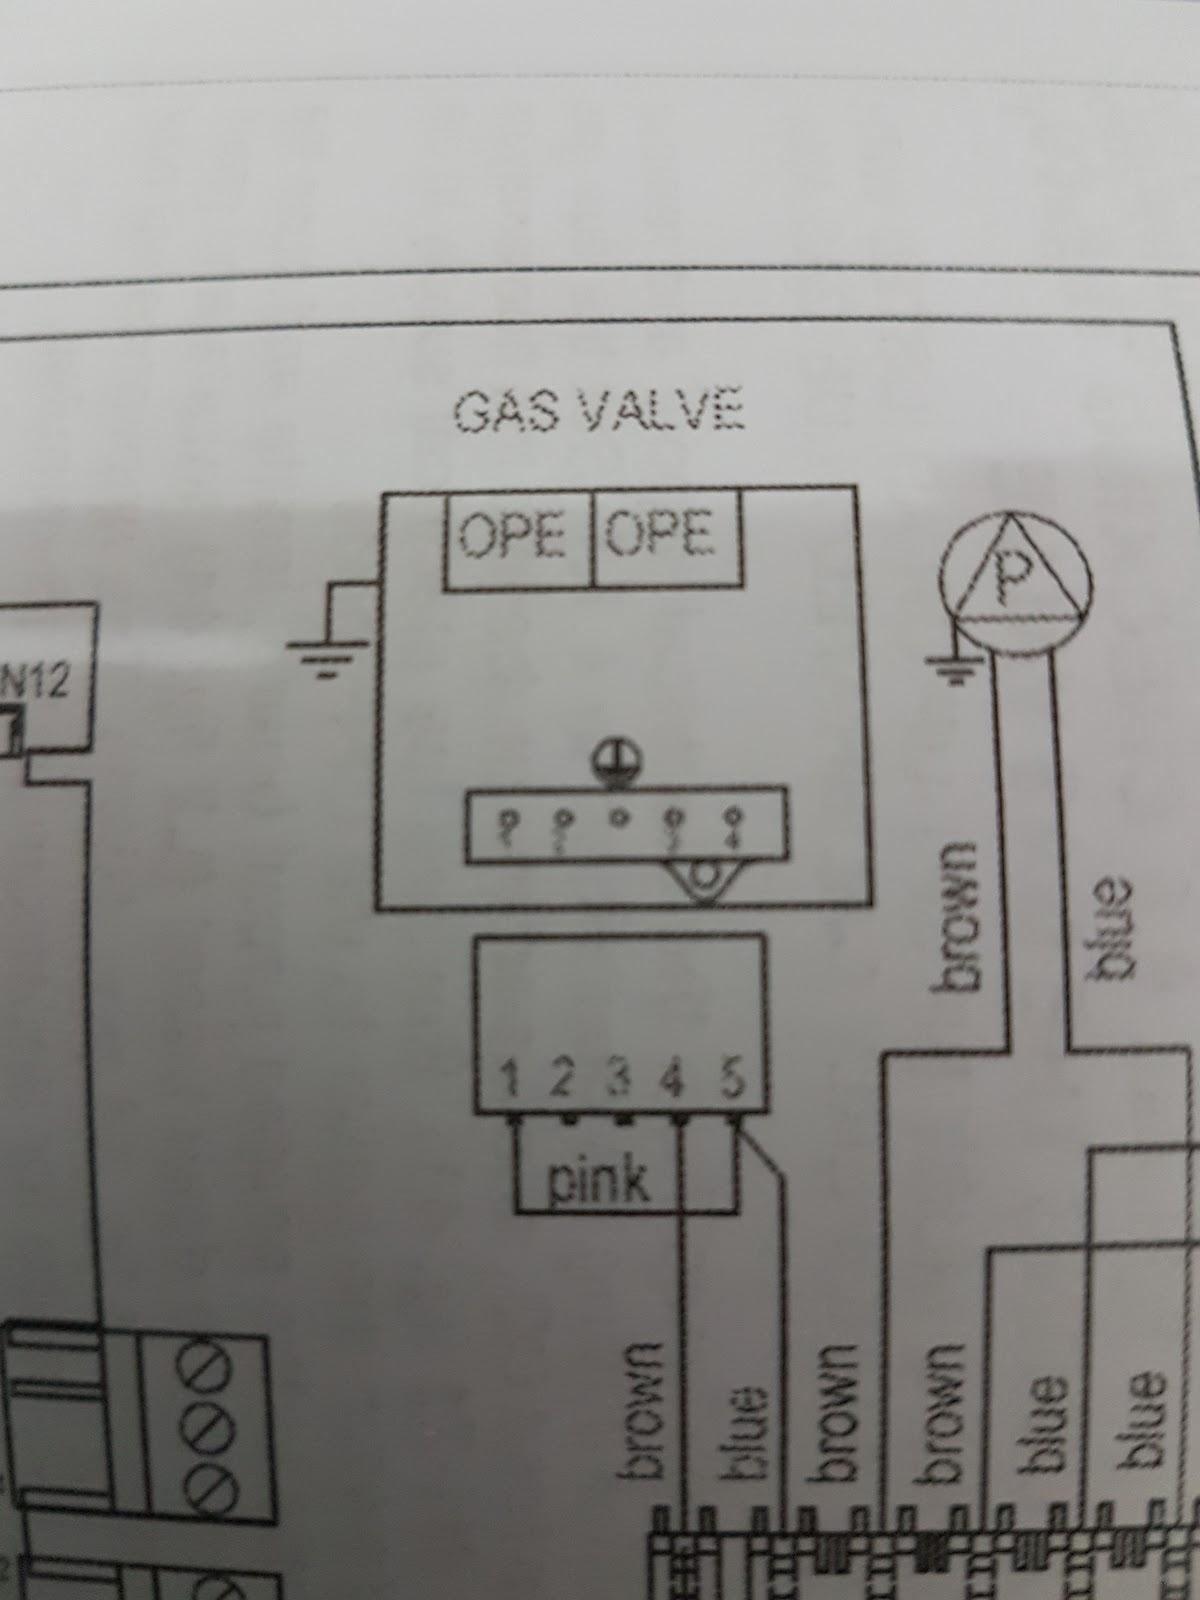 Worcester Greenstar Wiring Diagram For 4 Pin Round Trailer Plug The Technicians Handbook